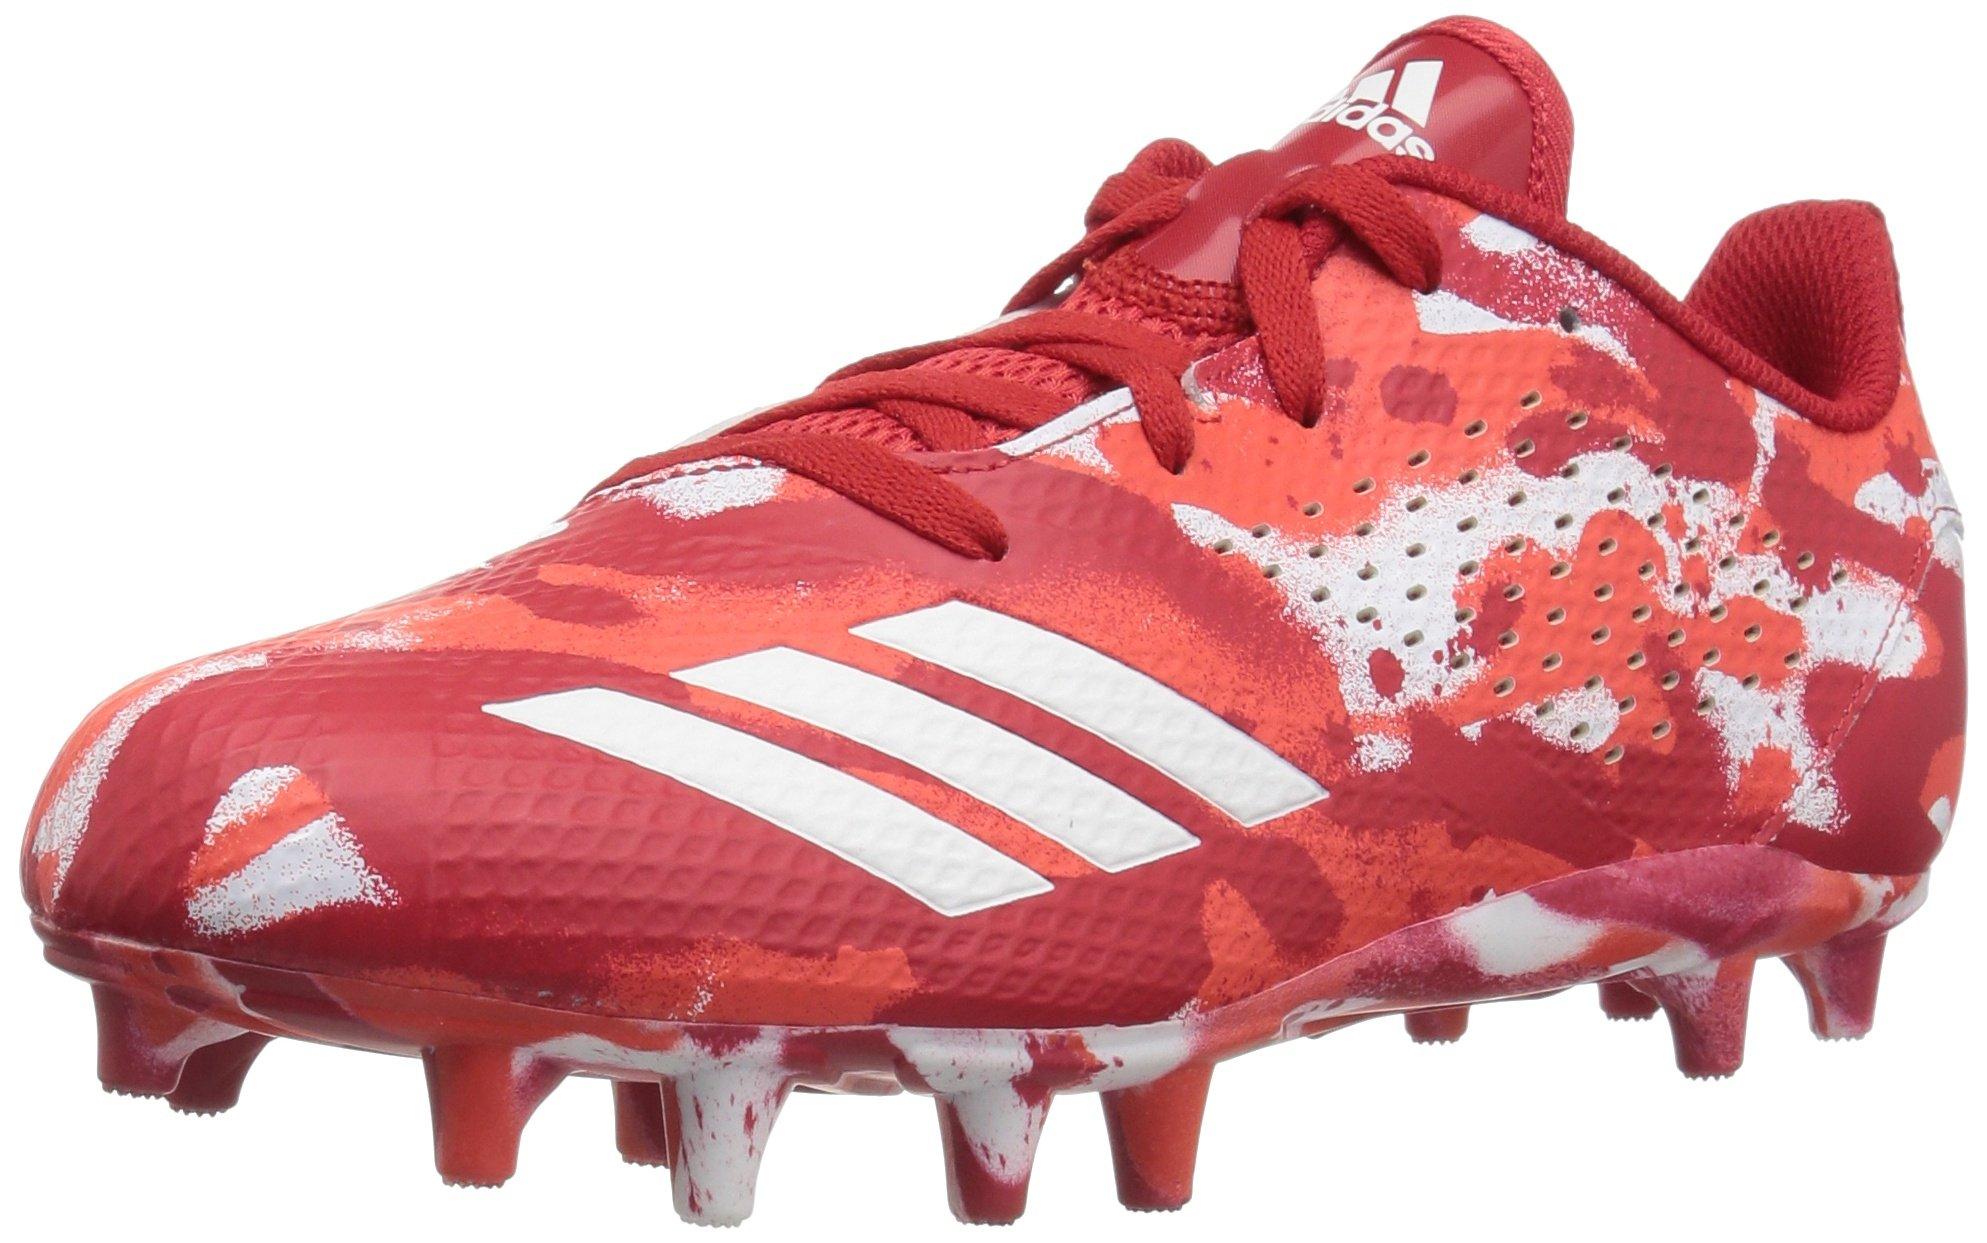 adidas Unisex Adizero 5-Star 7.0 Football Shoe, White/hi-res red/Scarlet, 1 M US Little Kid